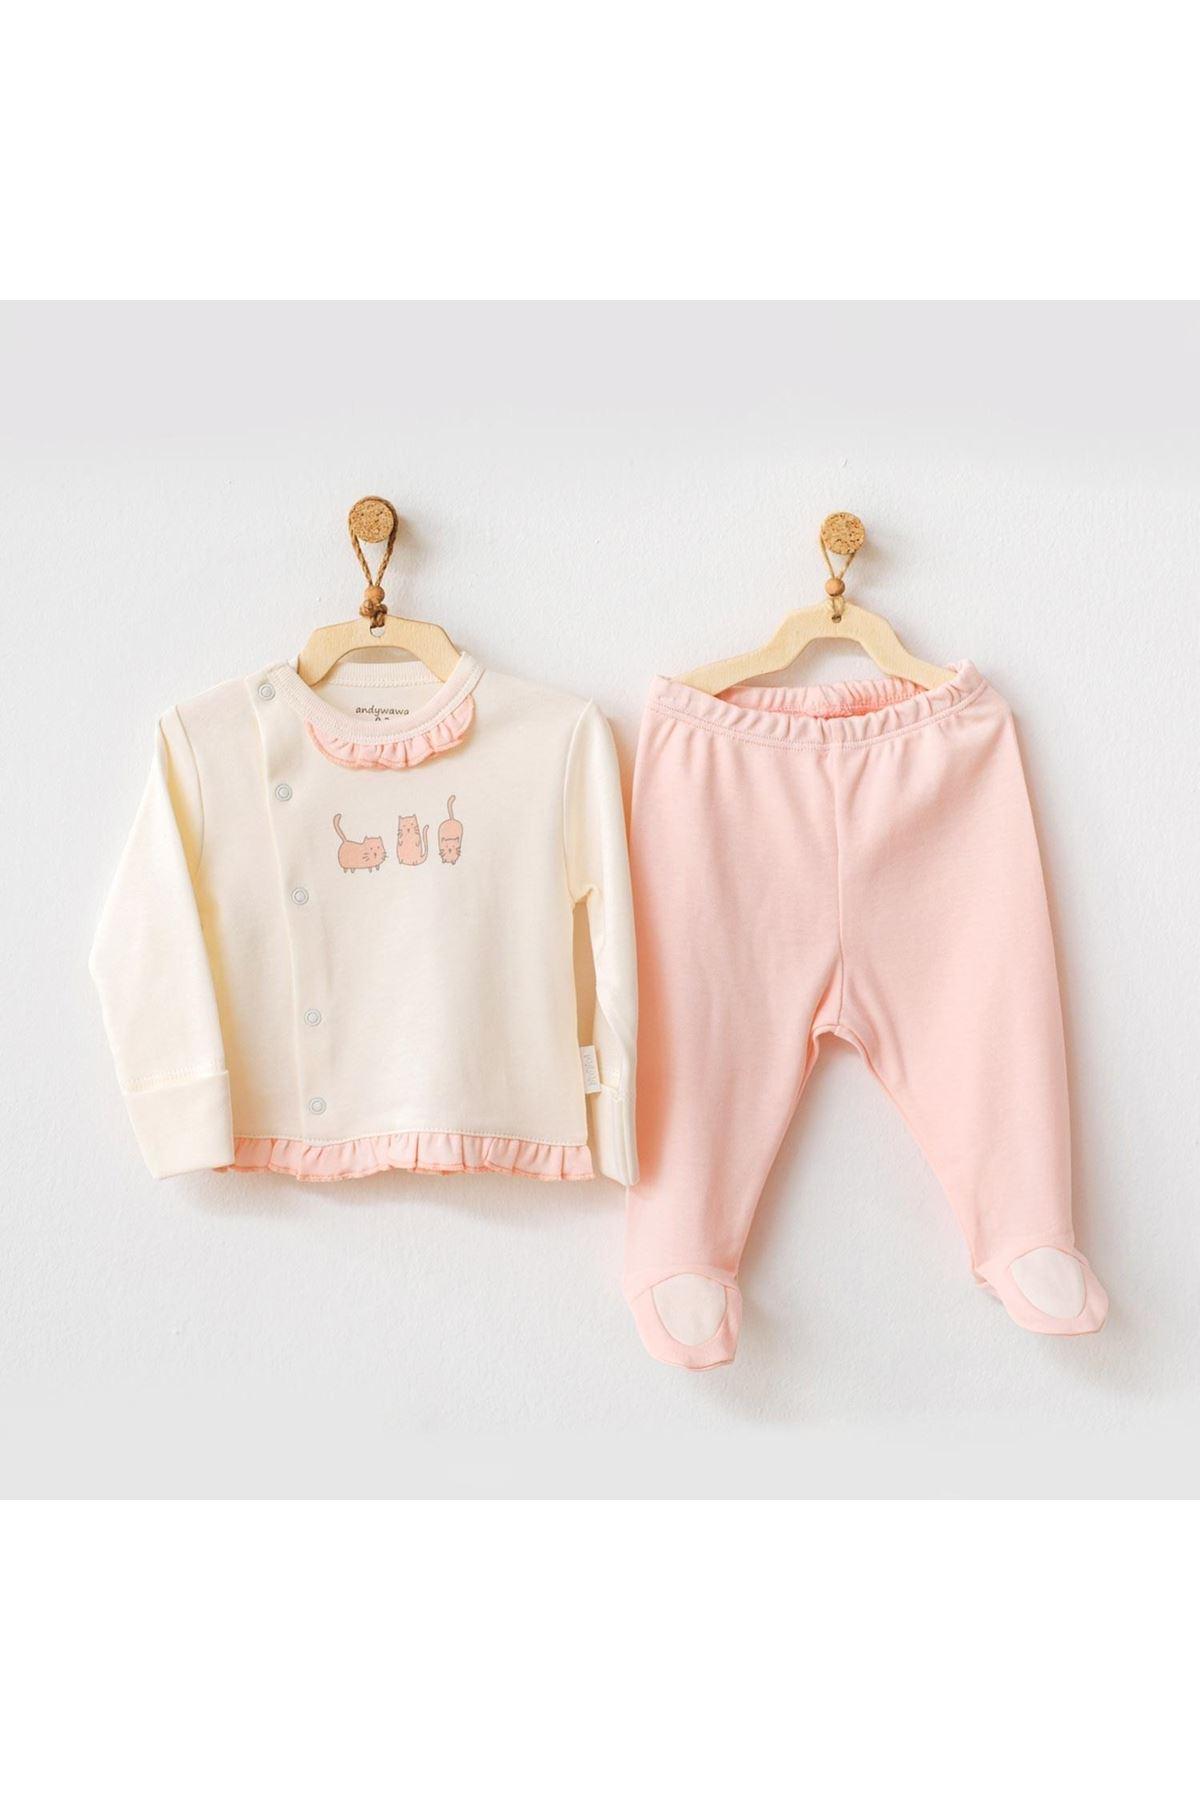 Andywawa AC21108 Meow 2li Bebek Takım Pink